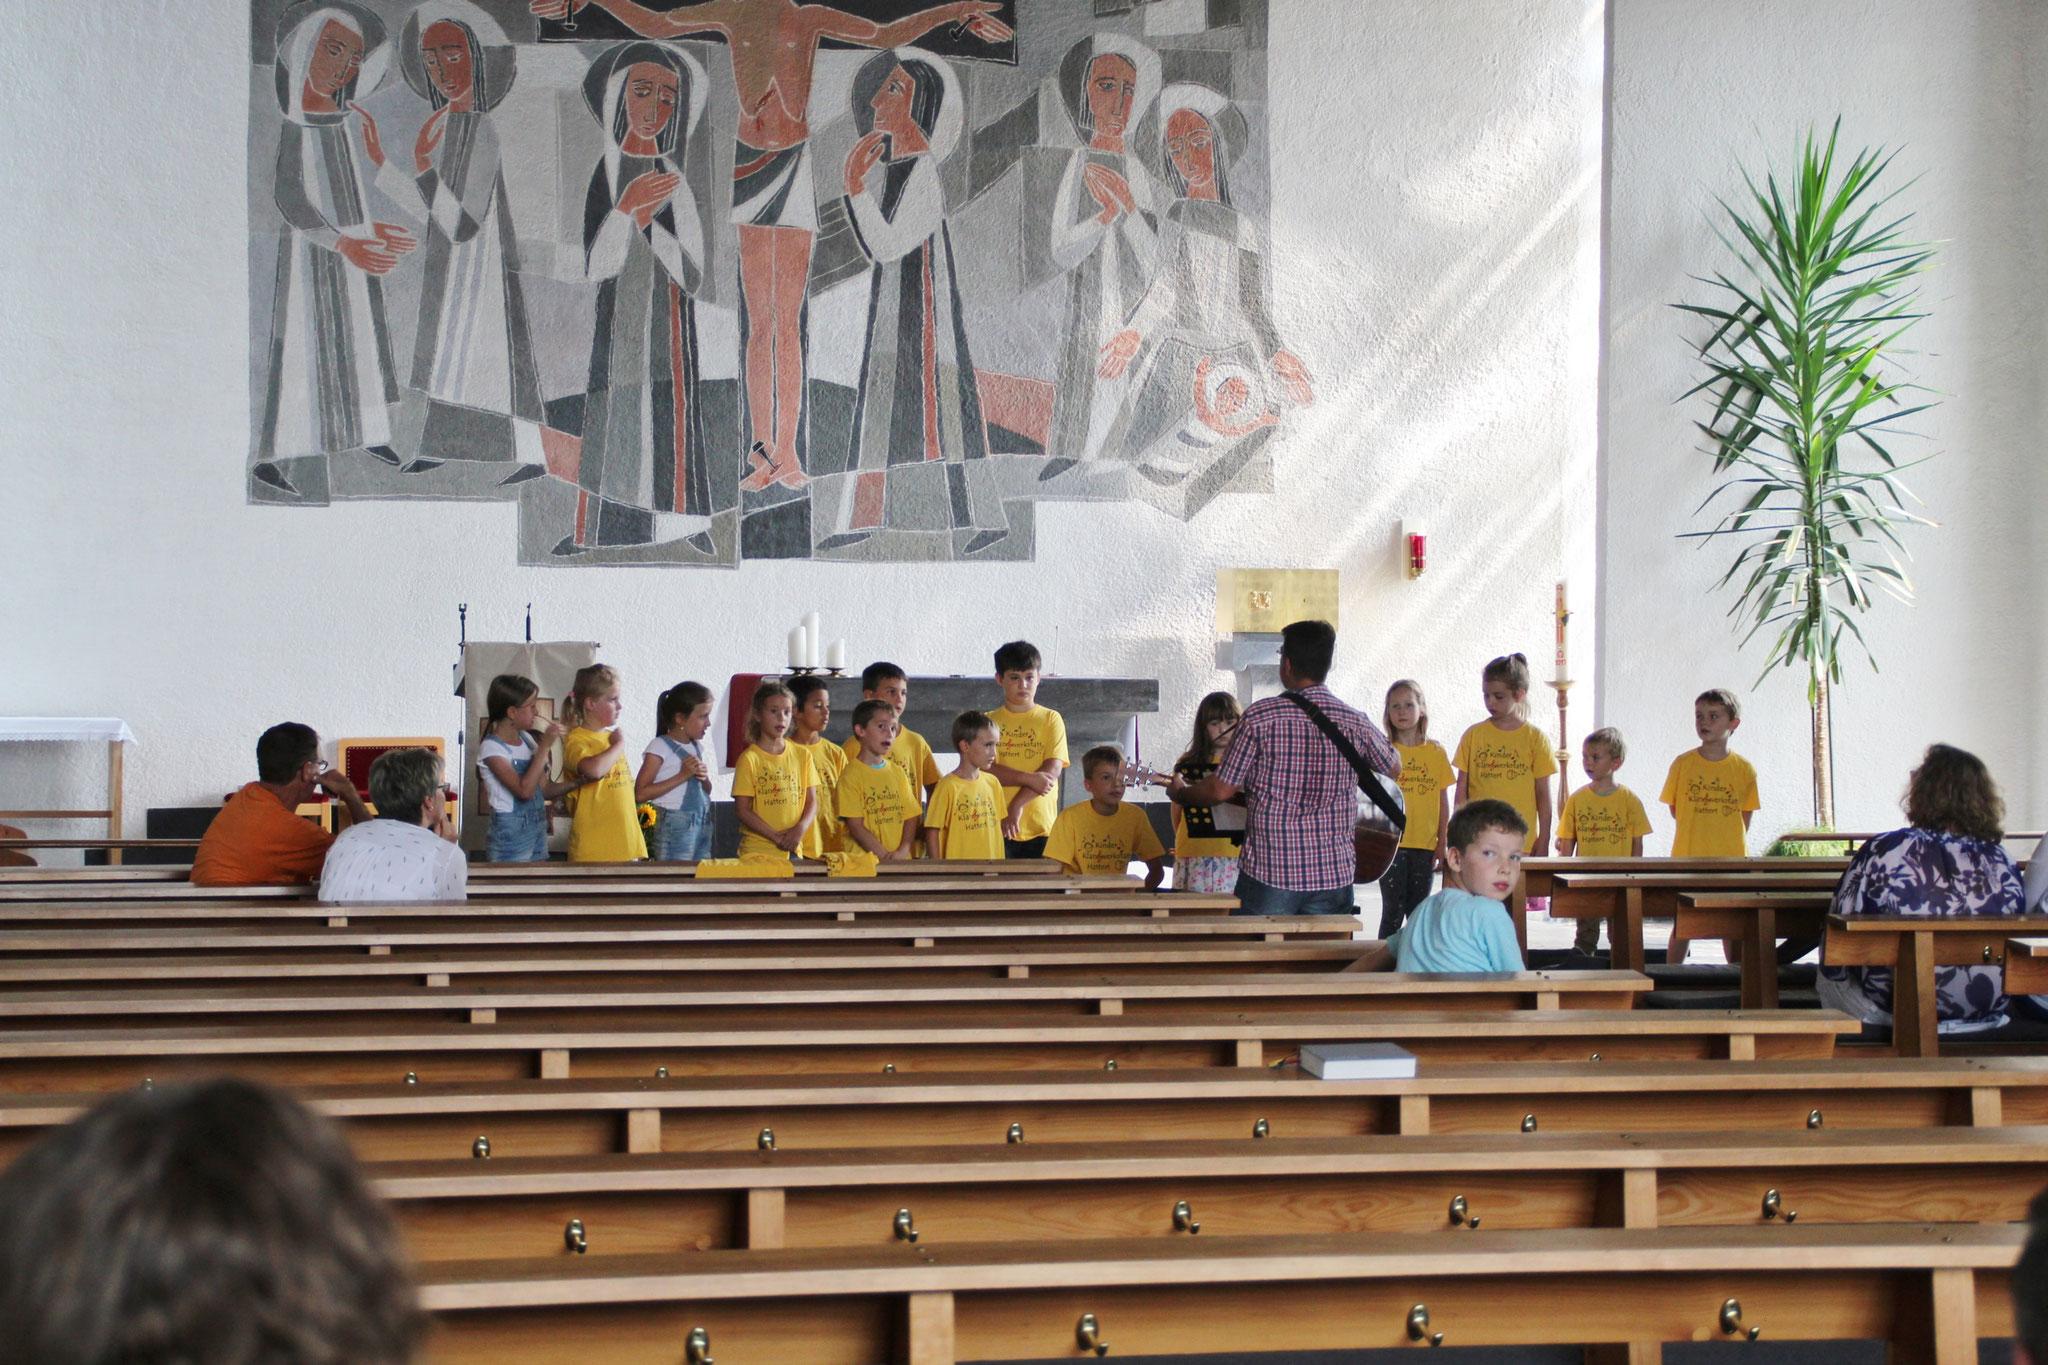 Generalprobe fürs Pfarrfest am 27.08.2017